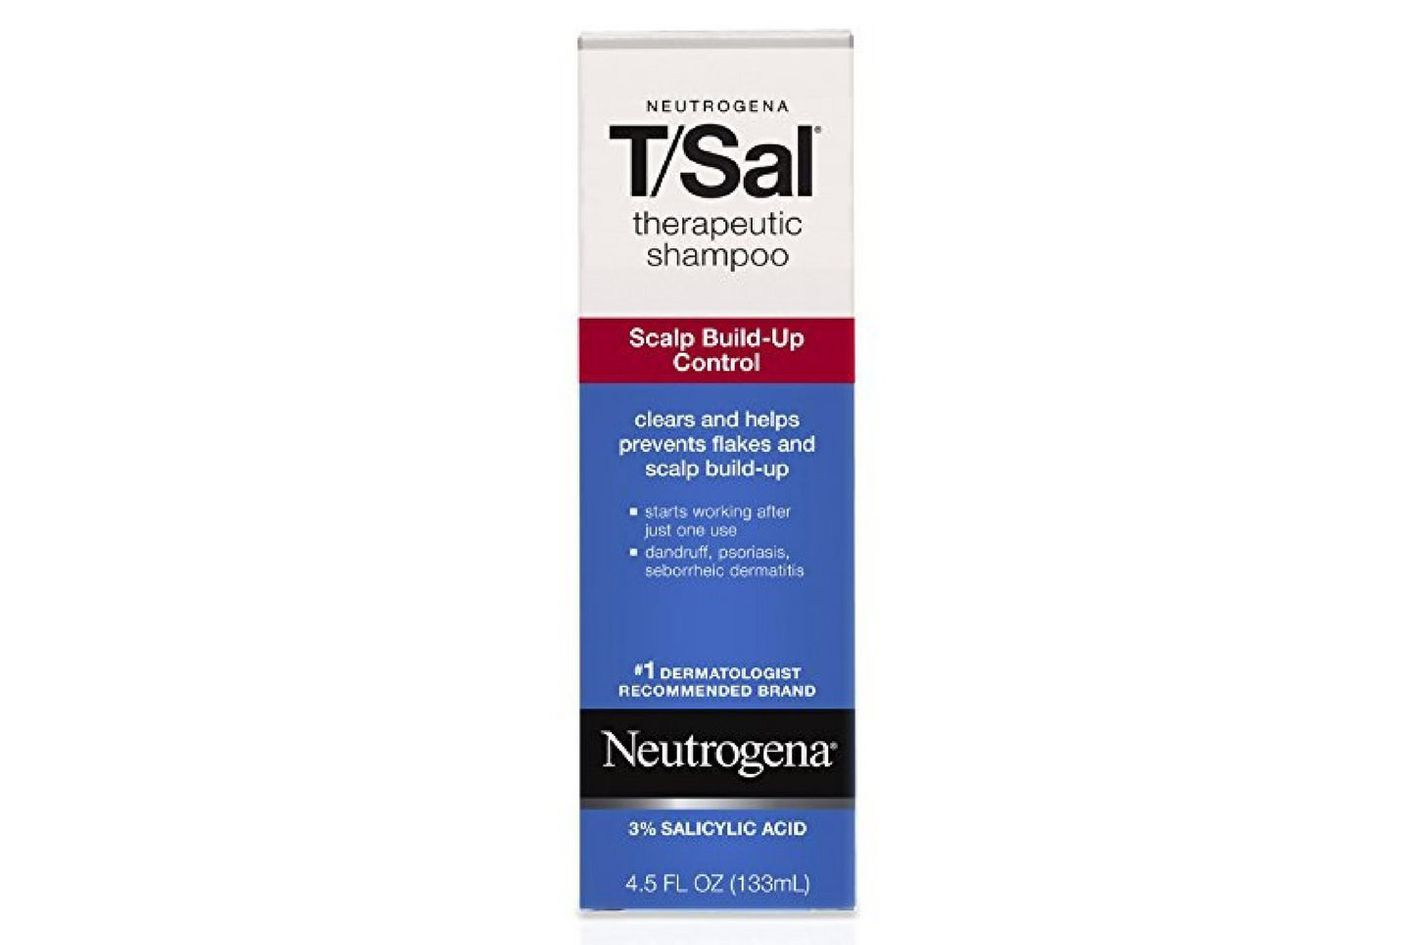 Neutrogena T/Sal Therapeutic Shampoo, Scalp Build-Up Control 4.5 oz